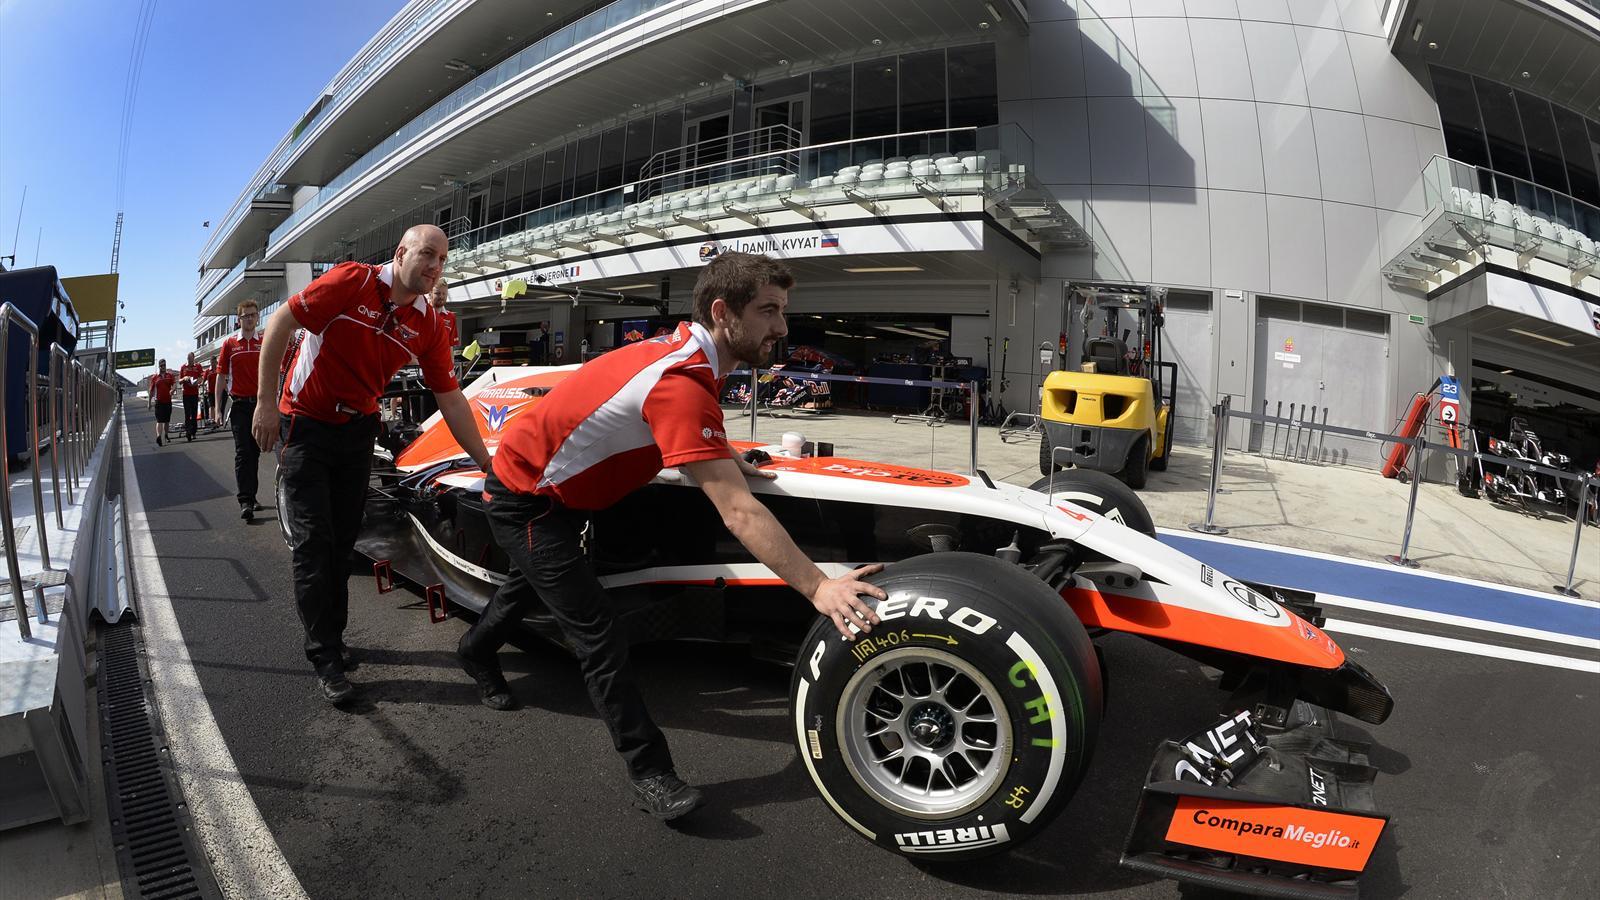 Marussia insists F1 return is viable - Formula 1 - Eurosport